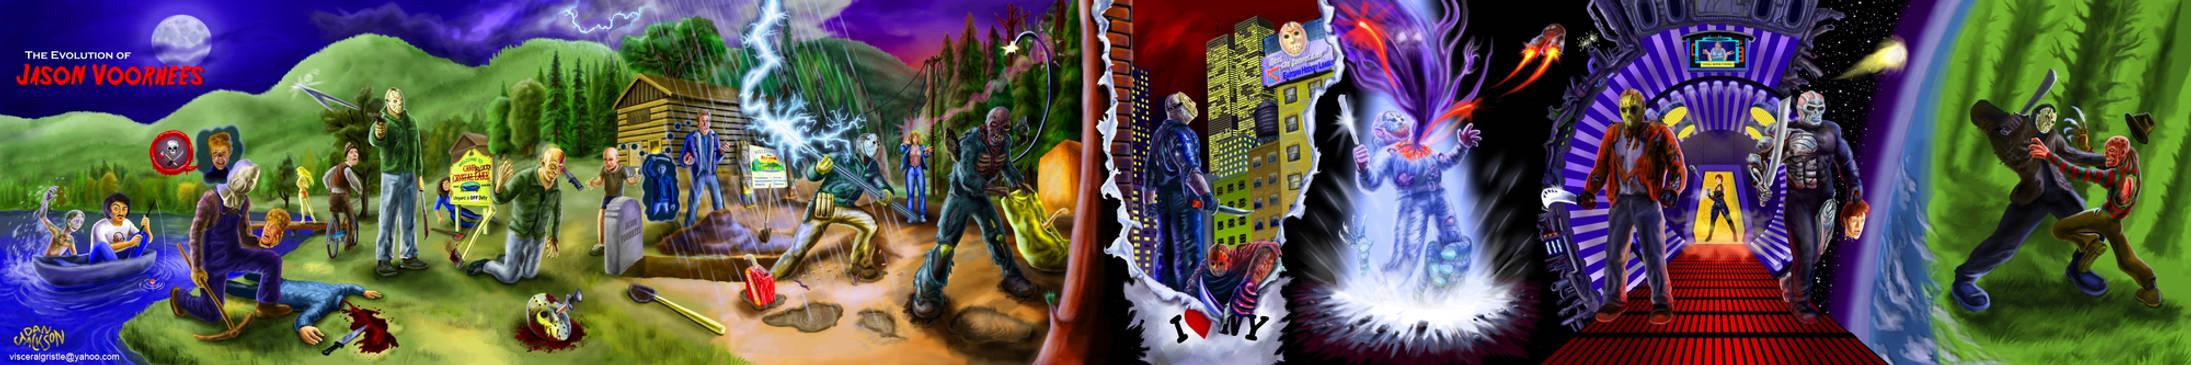 Evolution of Jason Voorhees